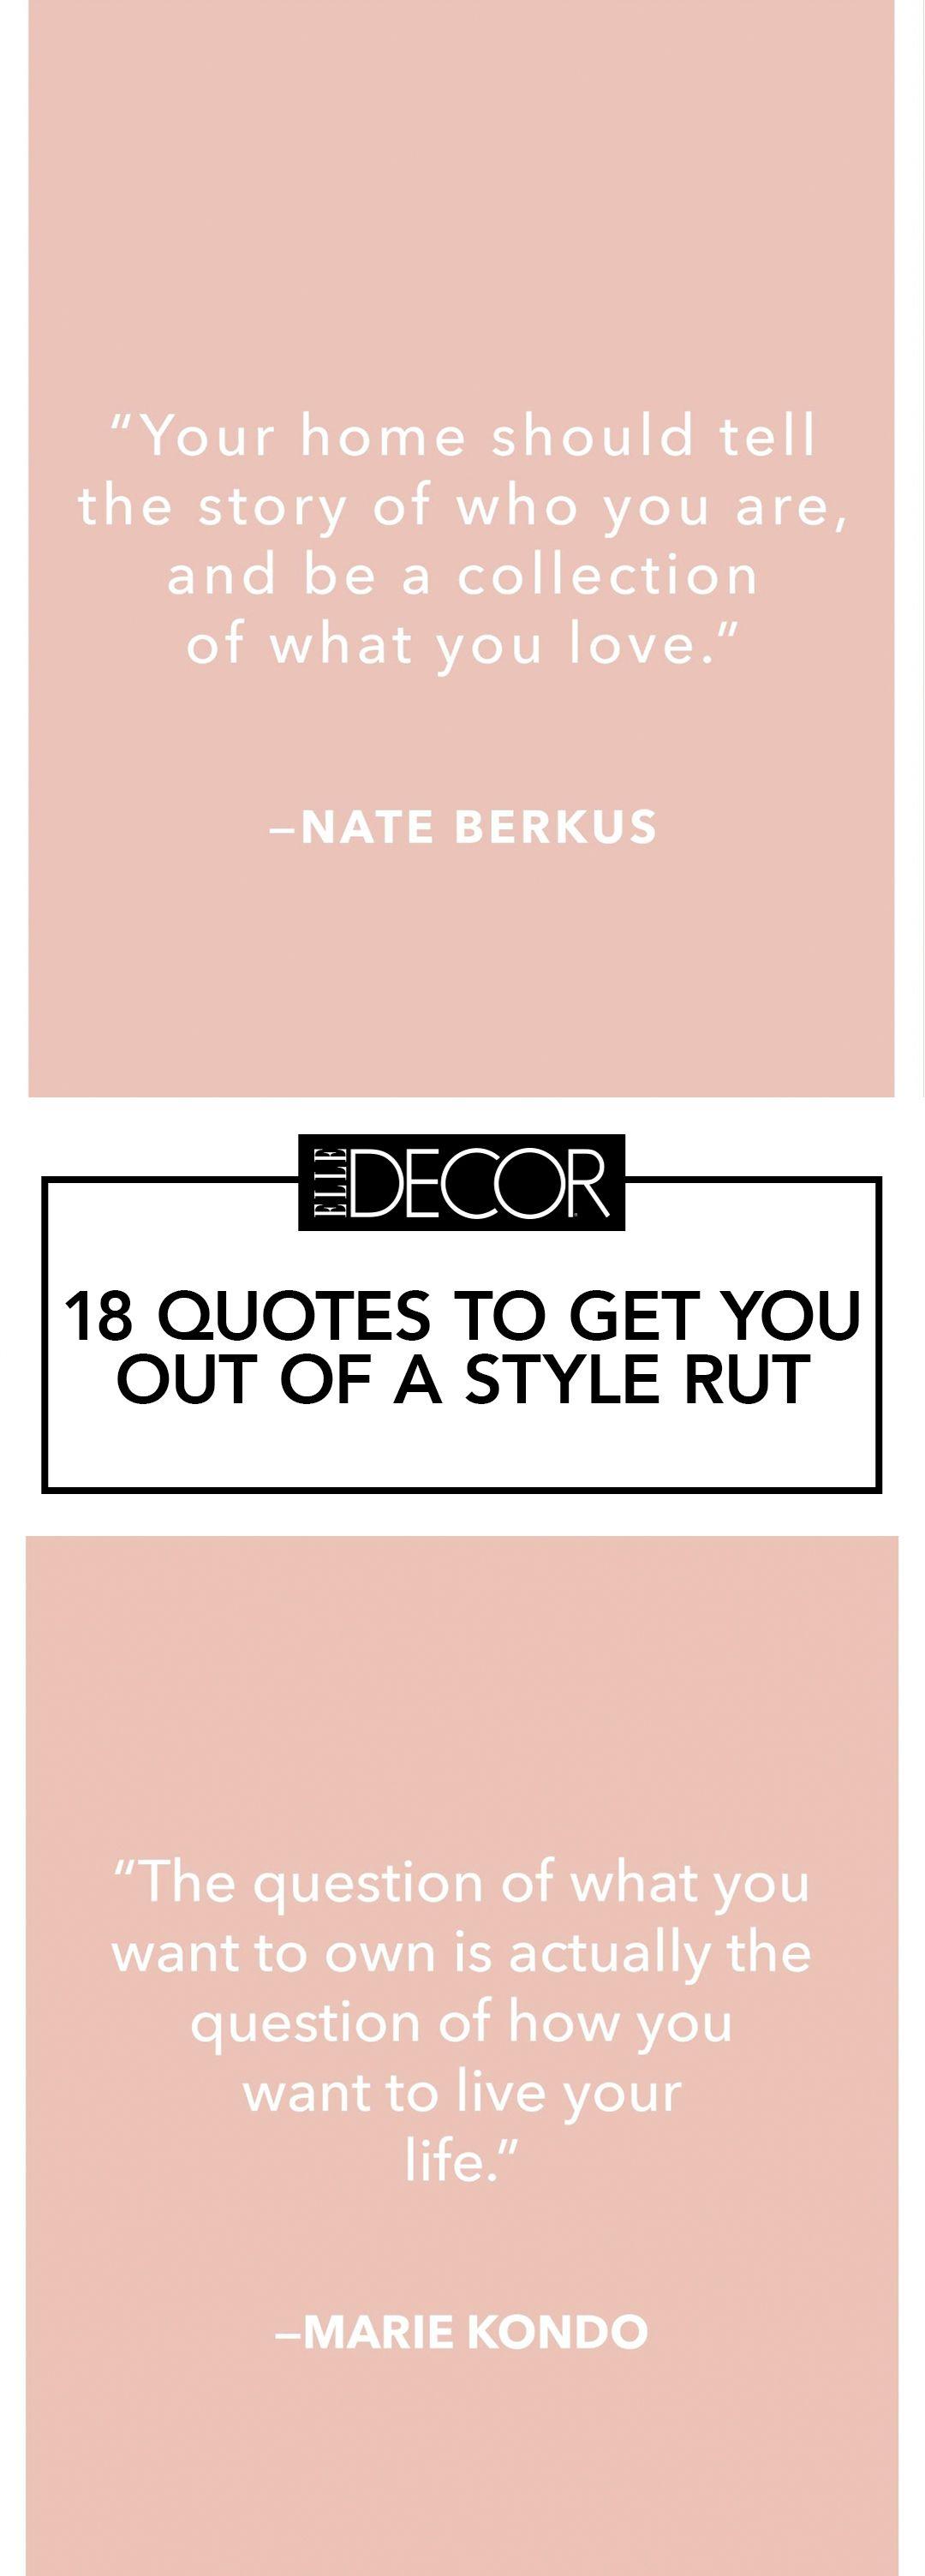 home decor quotes. 18 Interior Design Inspiration Quotes  Top Designers Share